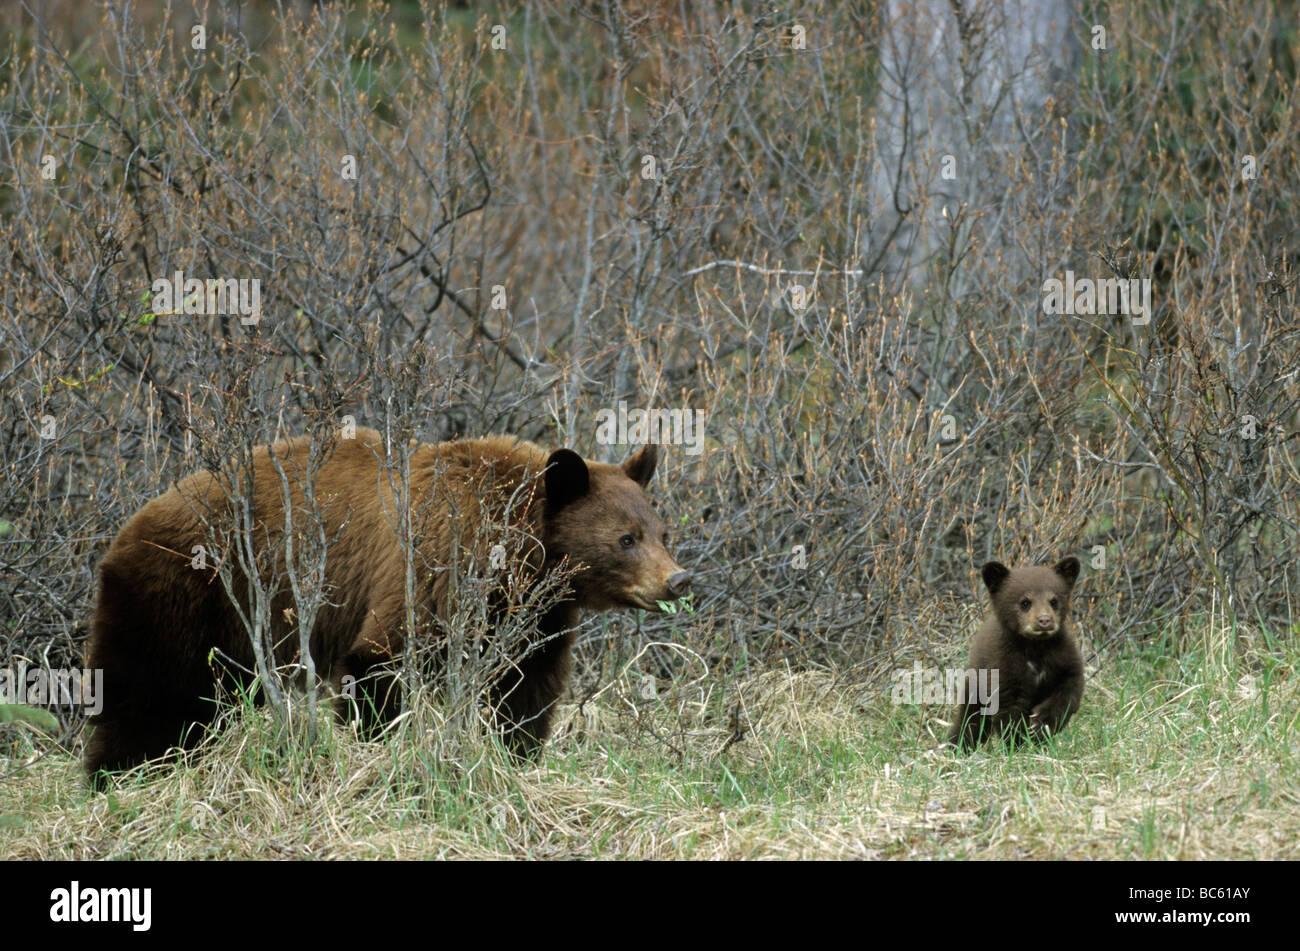 Black bear (Ursus Americanus) standing with cub in forest, Jasper National Park, Alberta, Canada Stock Photo